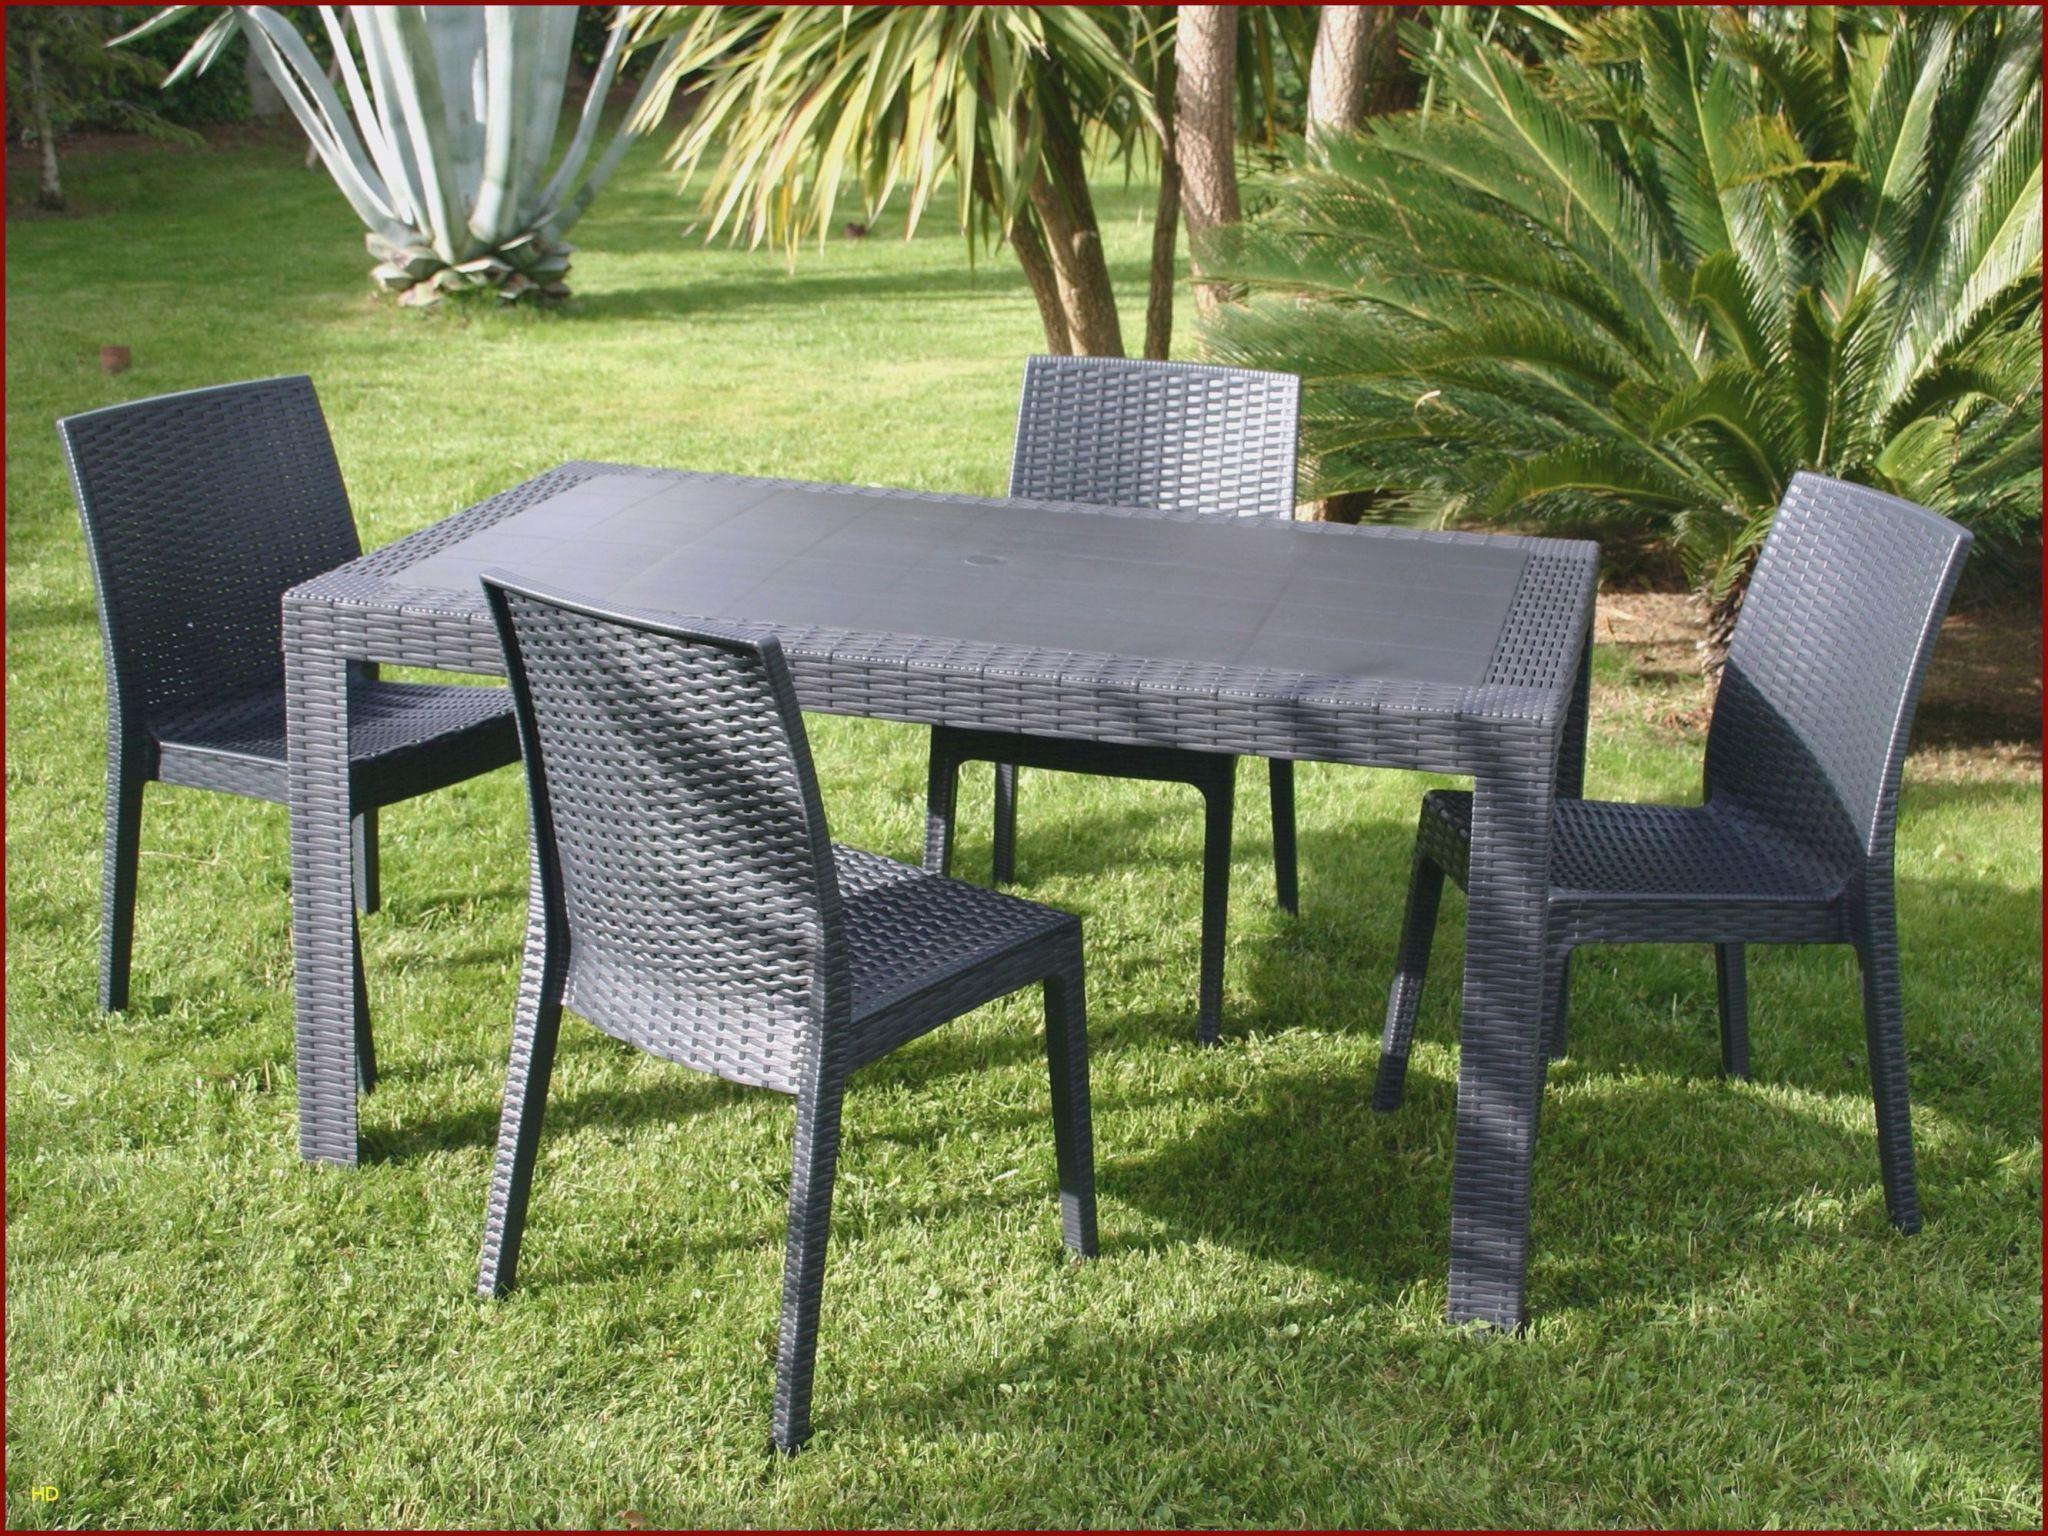 Salon De Jardin Rond Inspirant Salon De Jardin Leclerc Catalogue 2017 Le Meilleur De Table